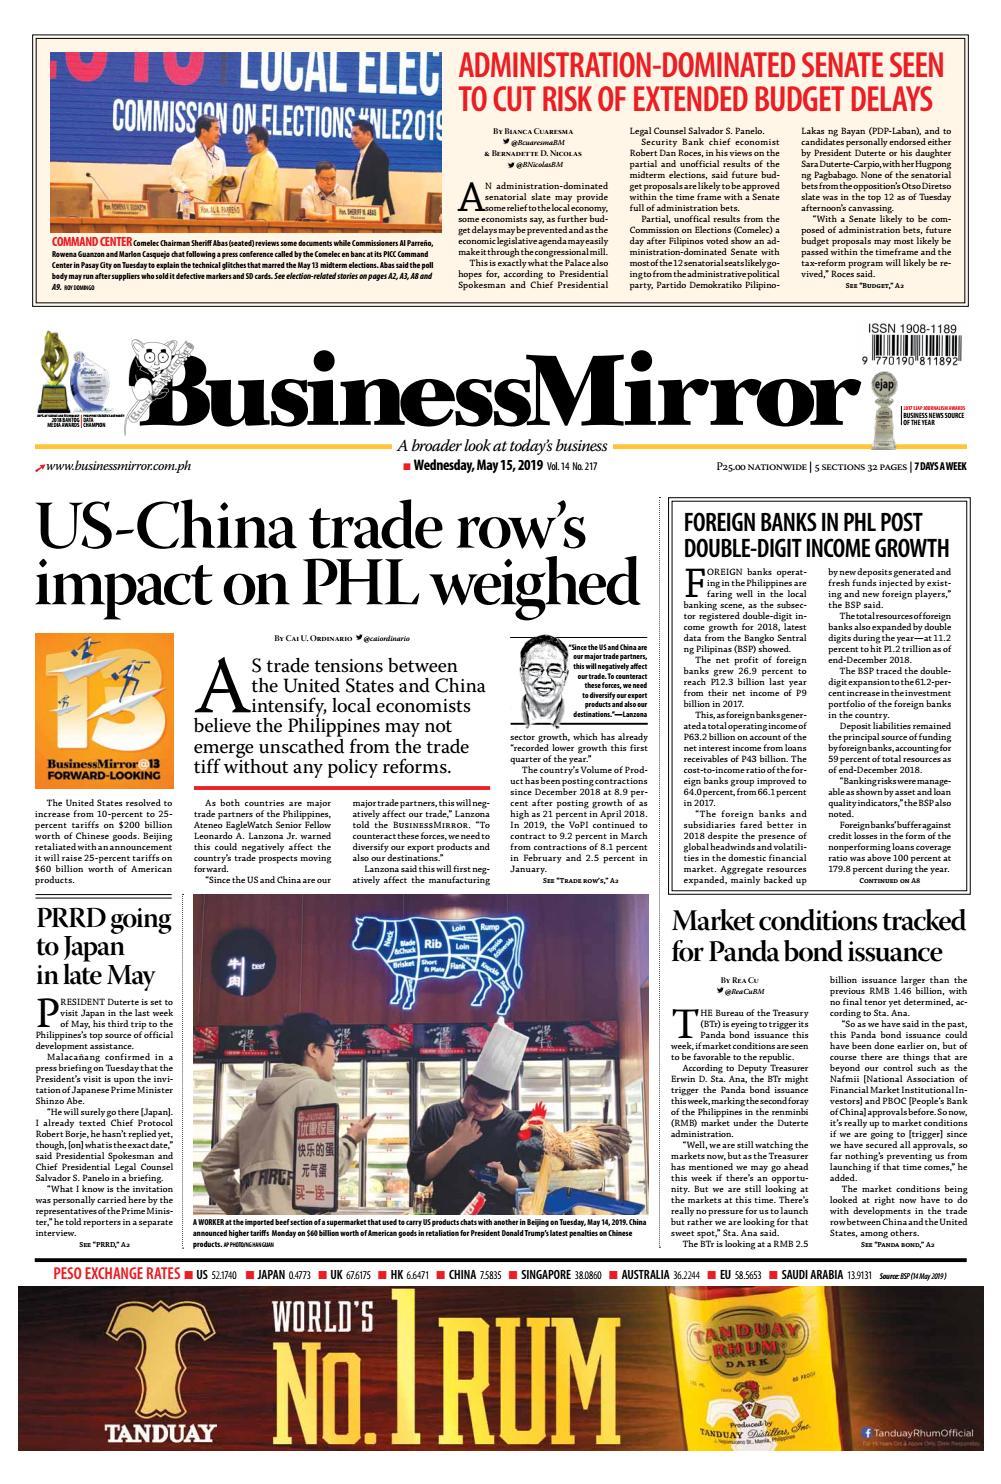 BusinessMirror May 15, 2019 by BusinessMirror - issuu